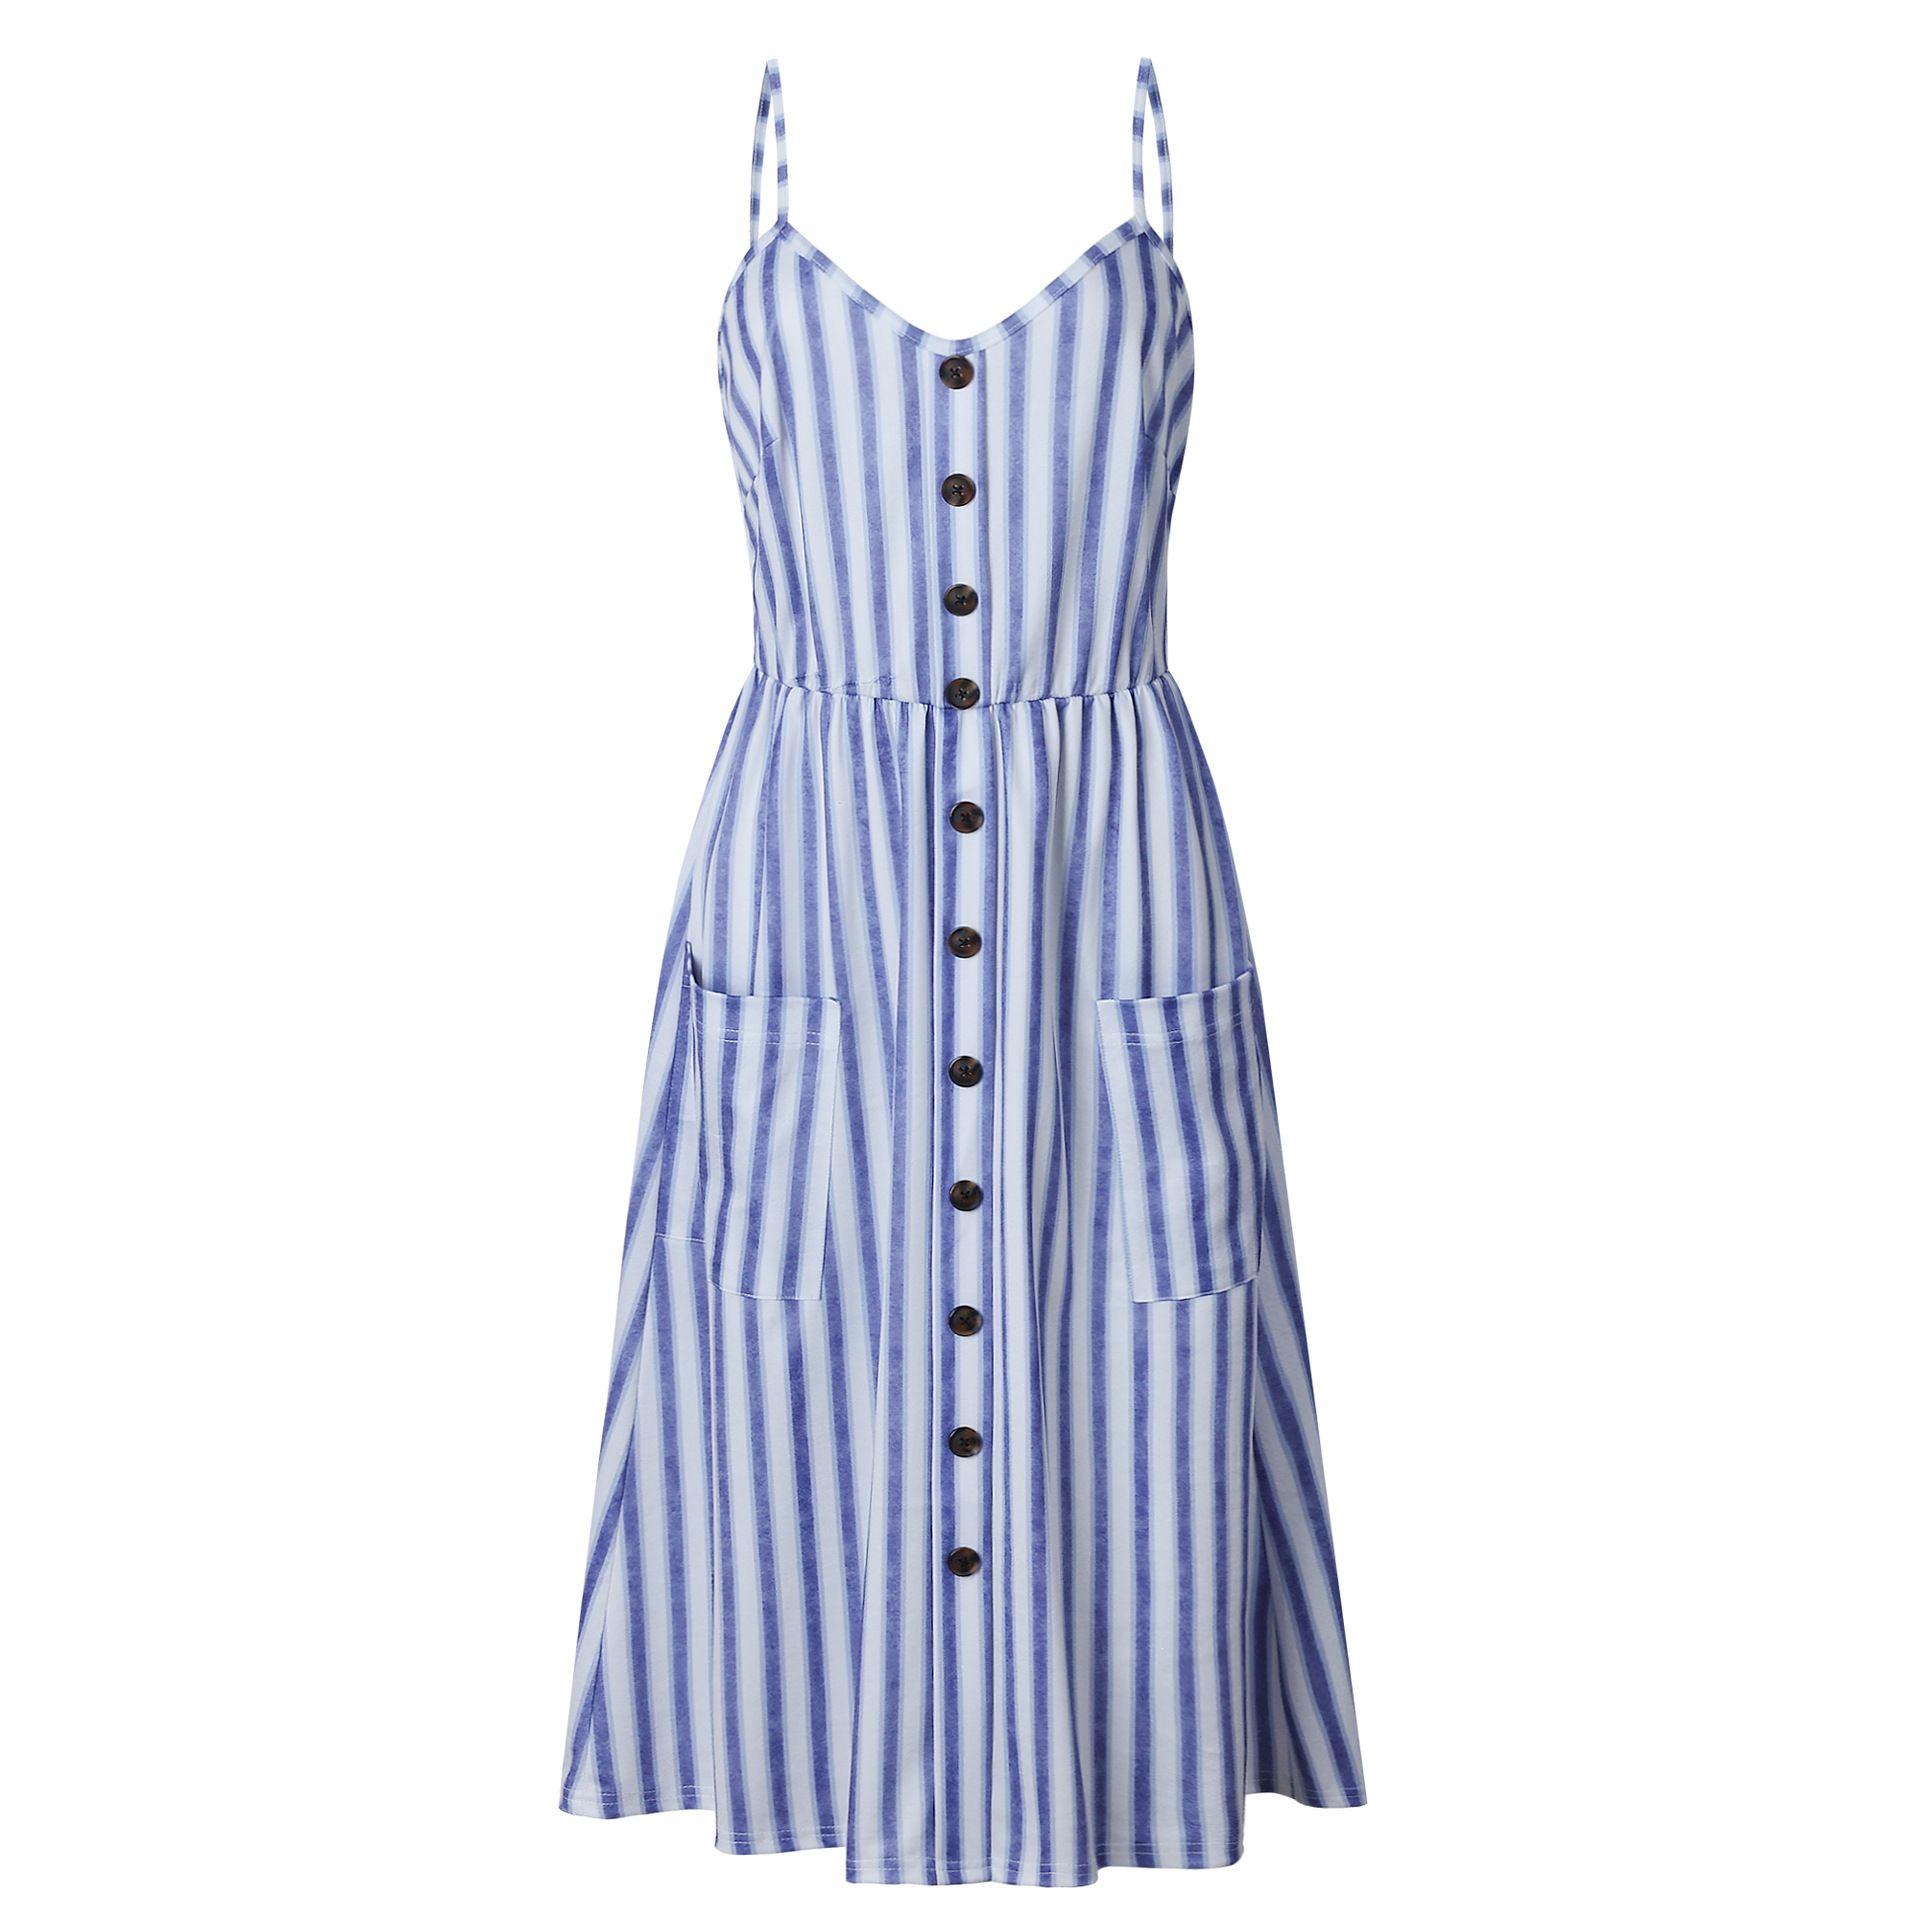 c4c9dcde81f3 Boho Floral Print Summer Dress Women V Neck Pockets Sleeveless Midi Dresses  Female Sunflower Pleated Backless Button Sexy Dress-in Dresses from Women s  ...